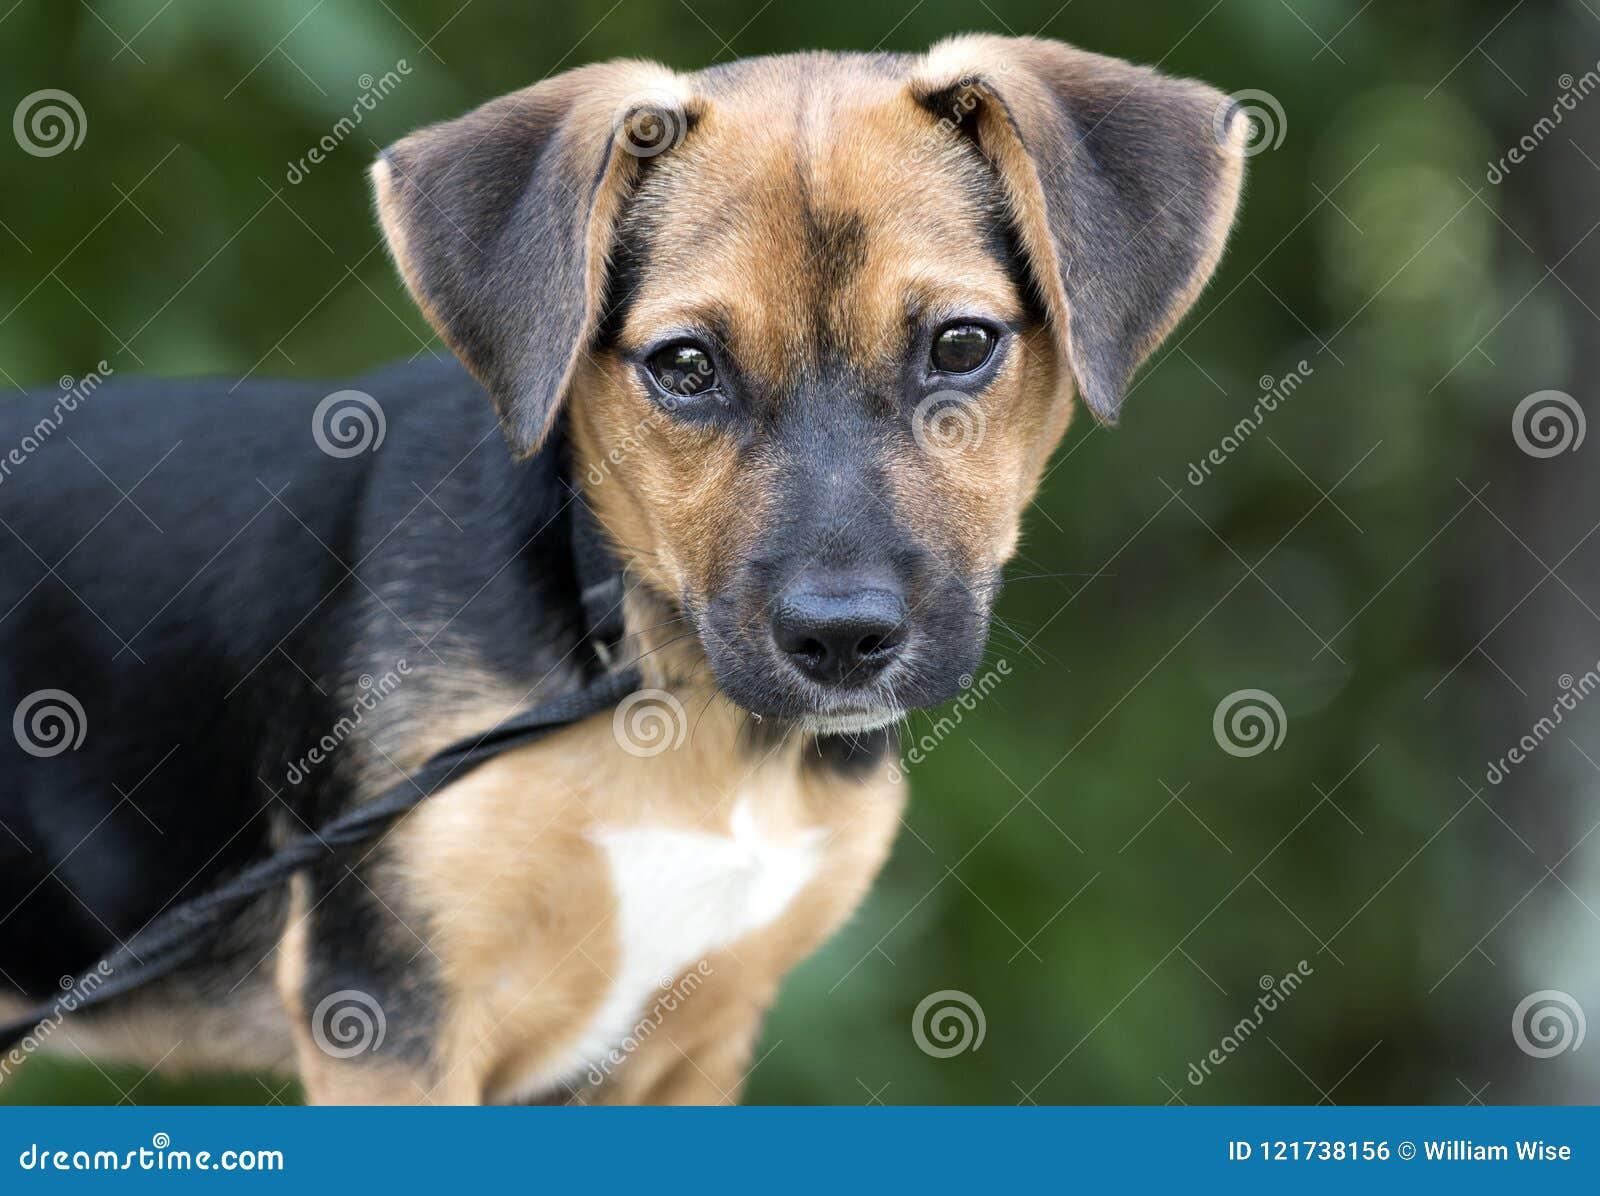 Cute Beagle mix puppy dog pet adoption photo